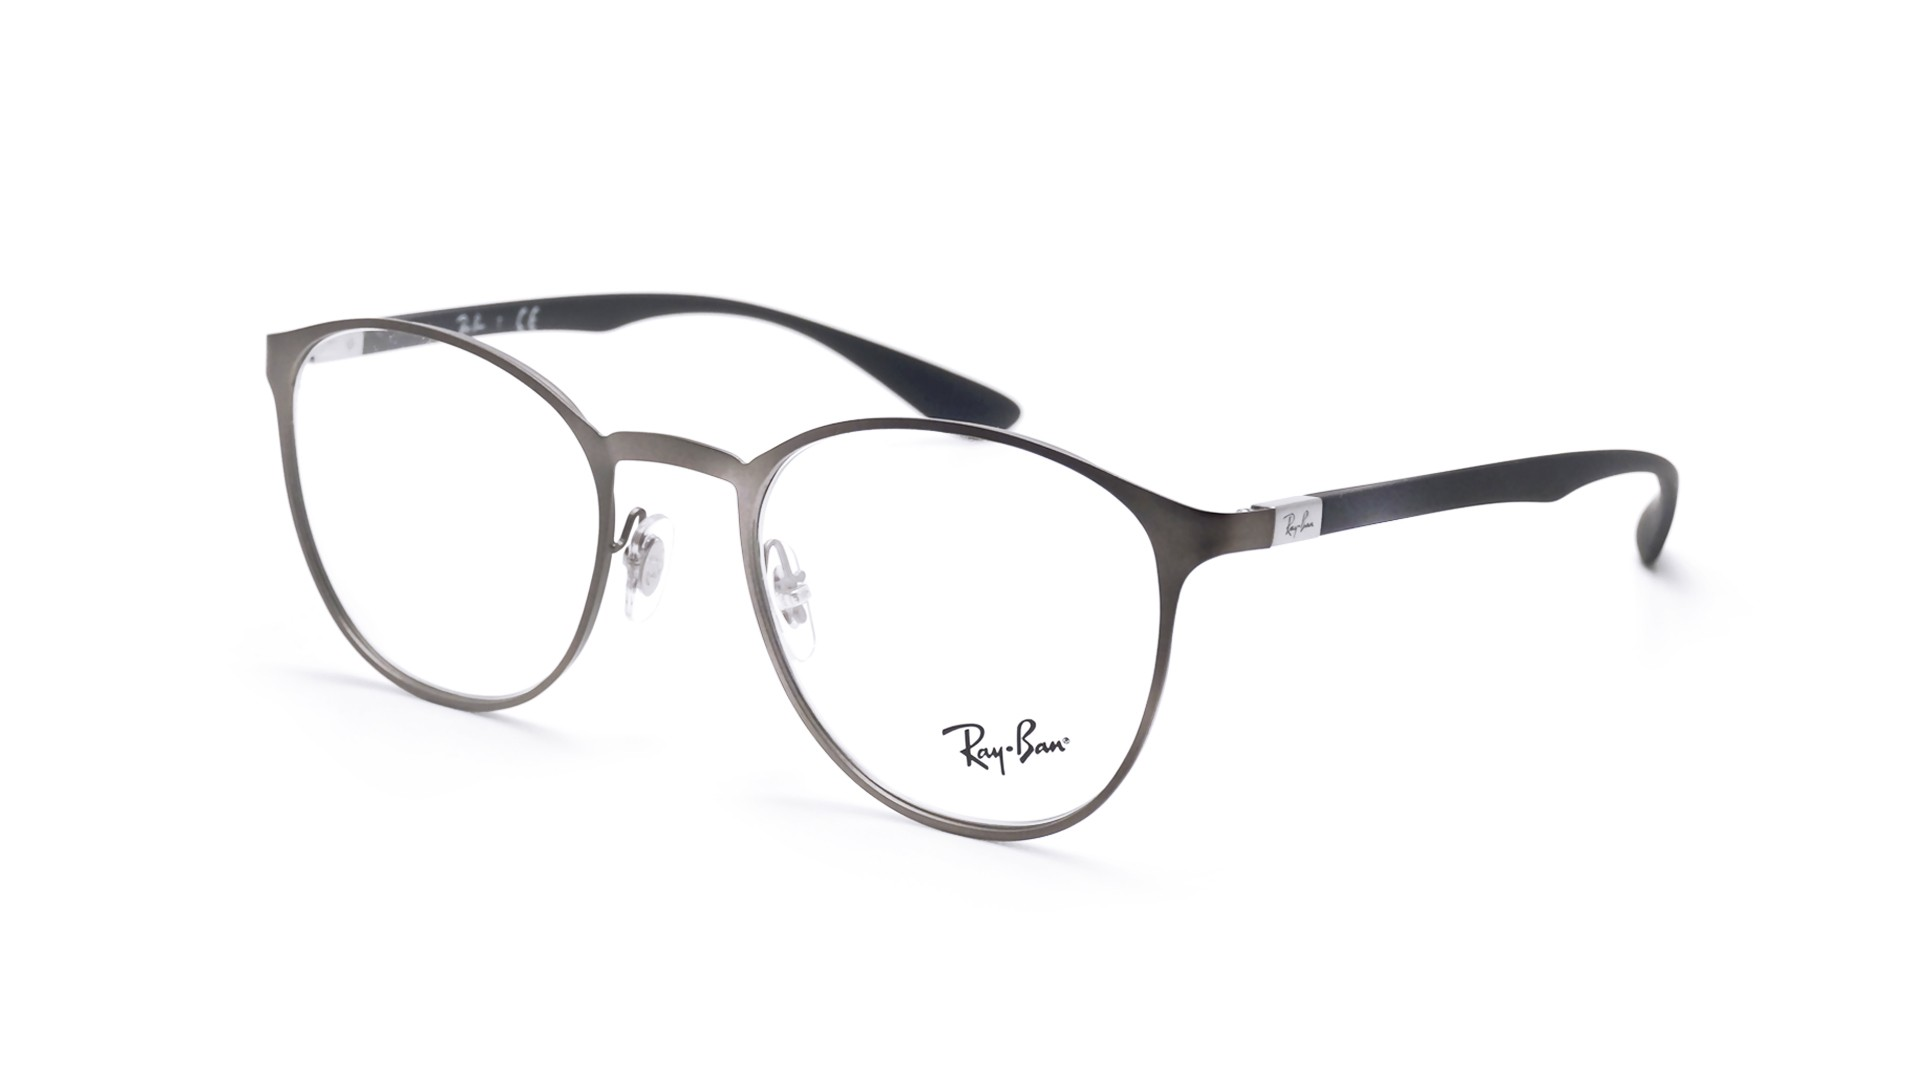 b0e9ea004b Eyeglasses Ray-Ban RX6355 RB6355 2620 50-20 Grey Mat Medium